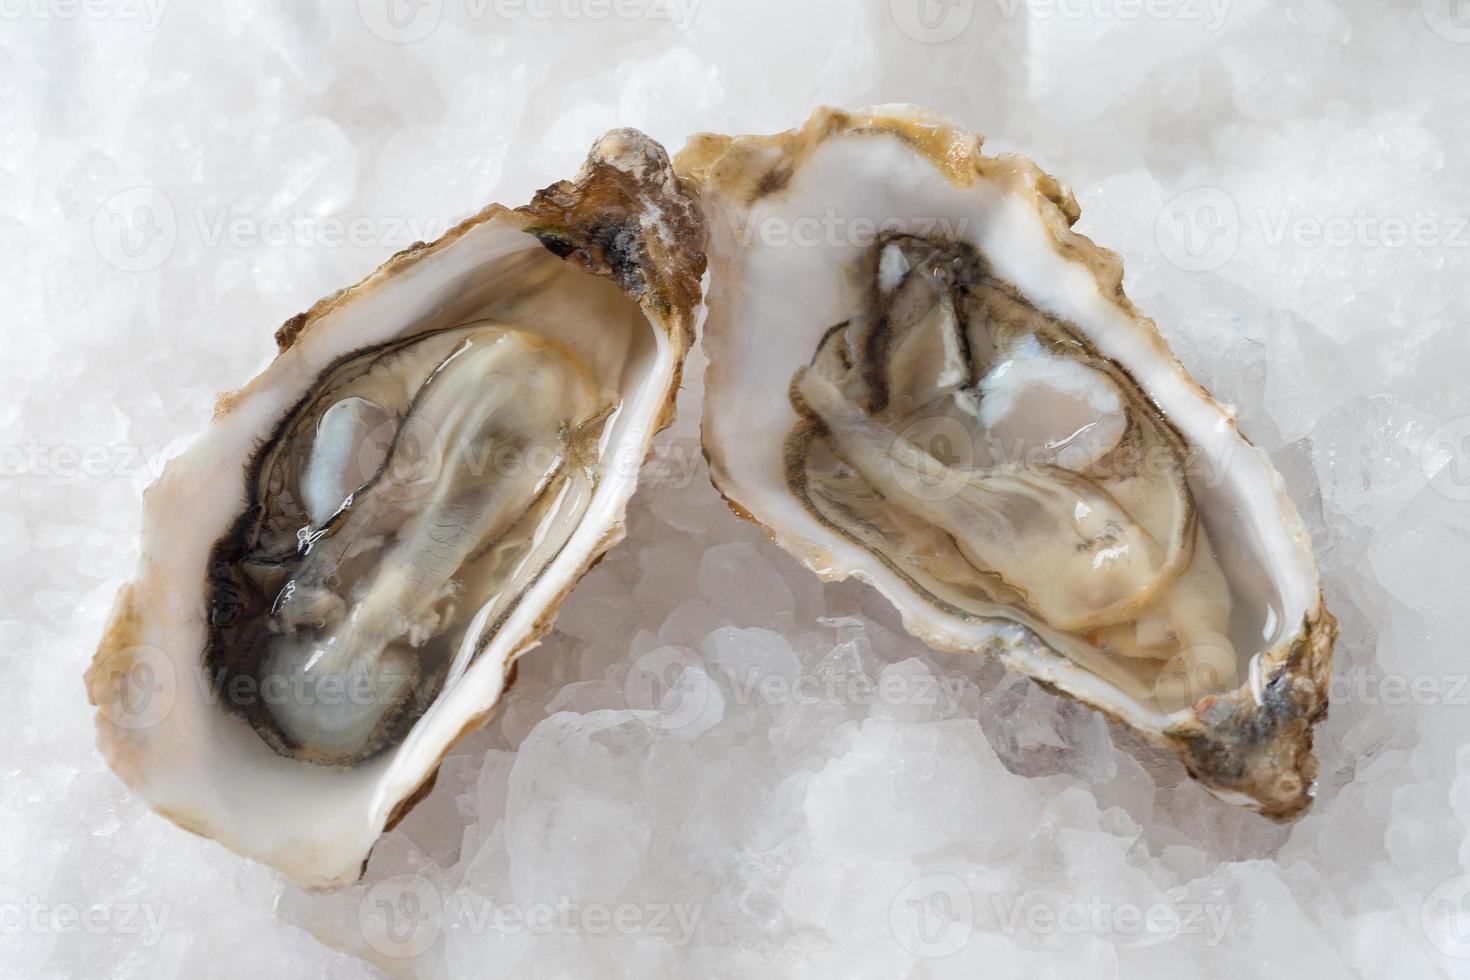 Franse voorgerecht oesters foto